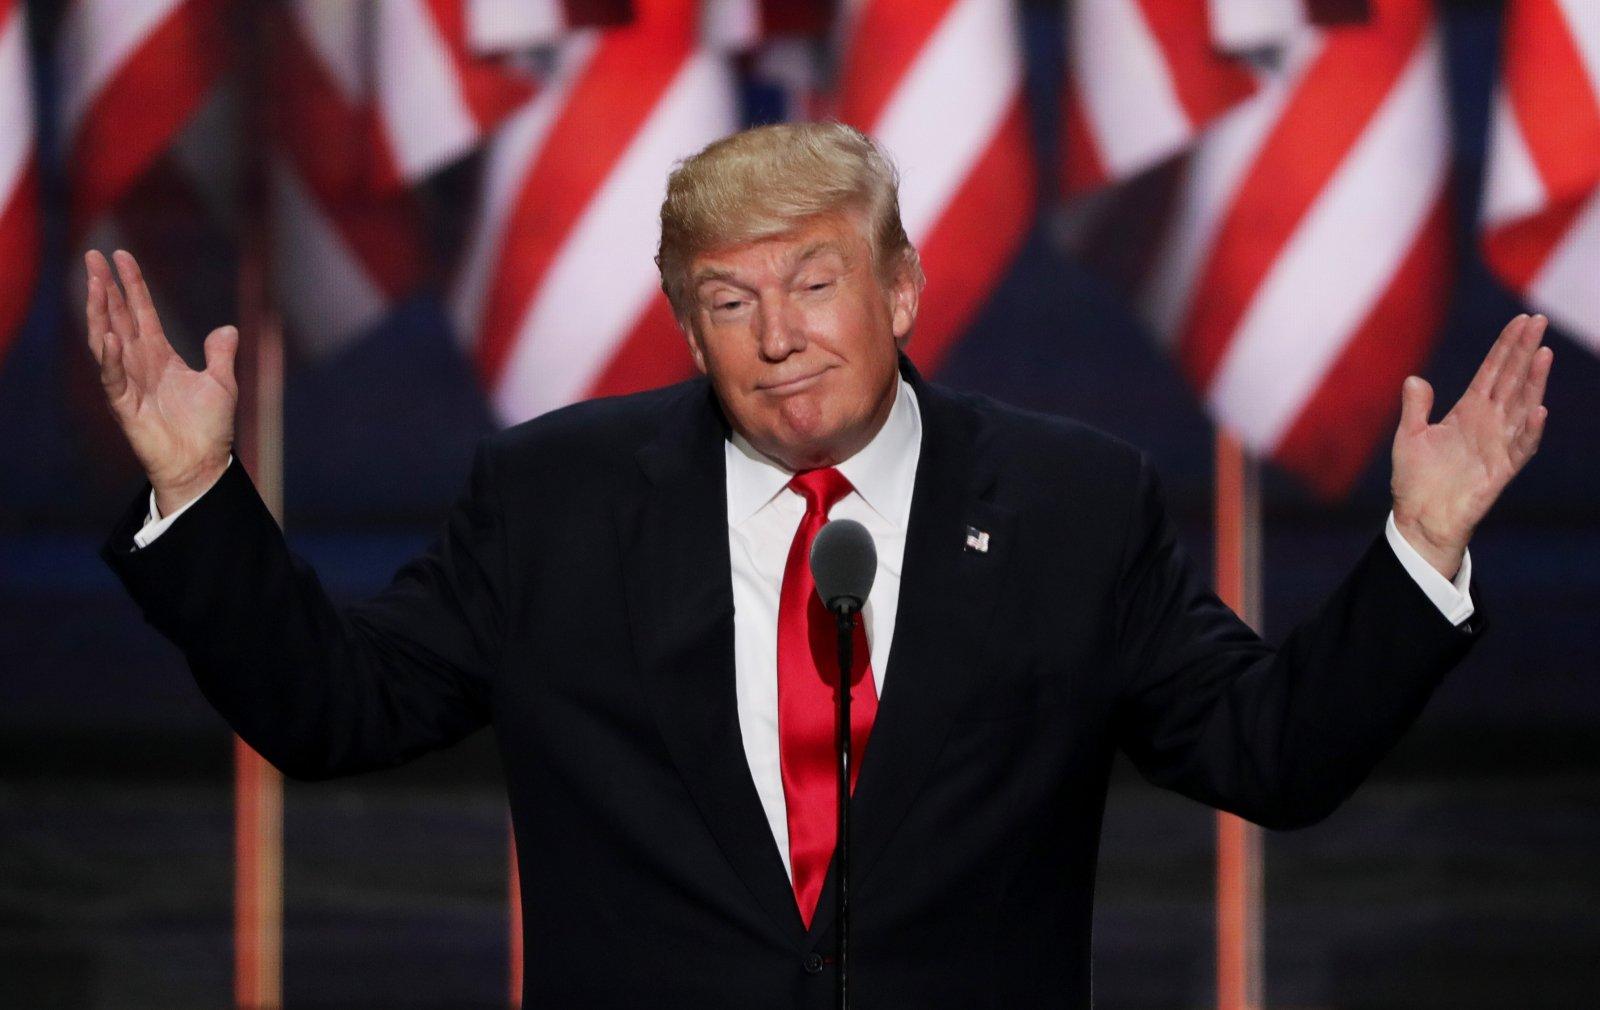 Donald Trump Qualcomm Broadcom